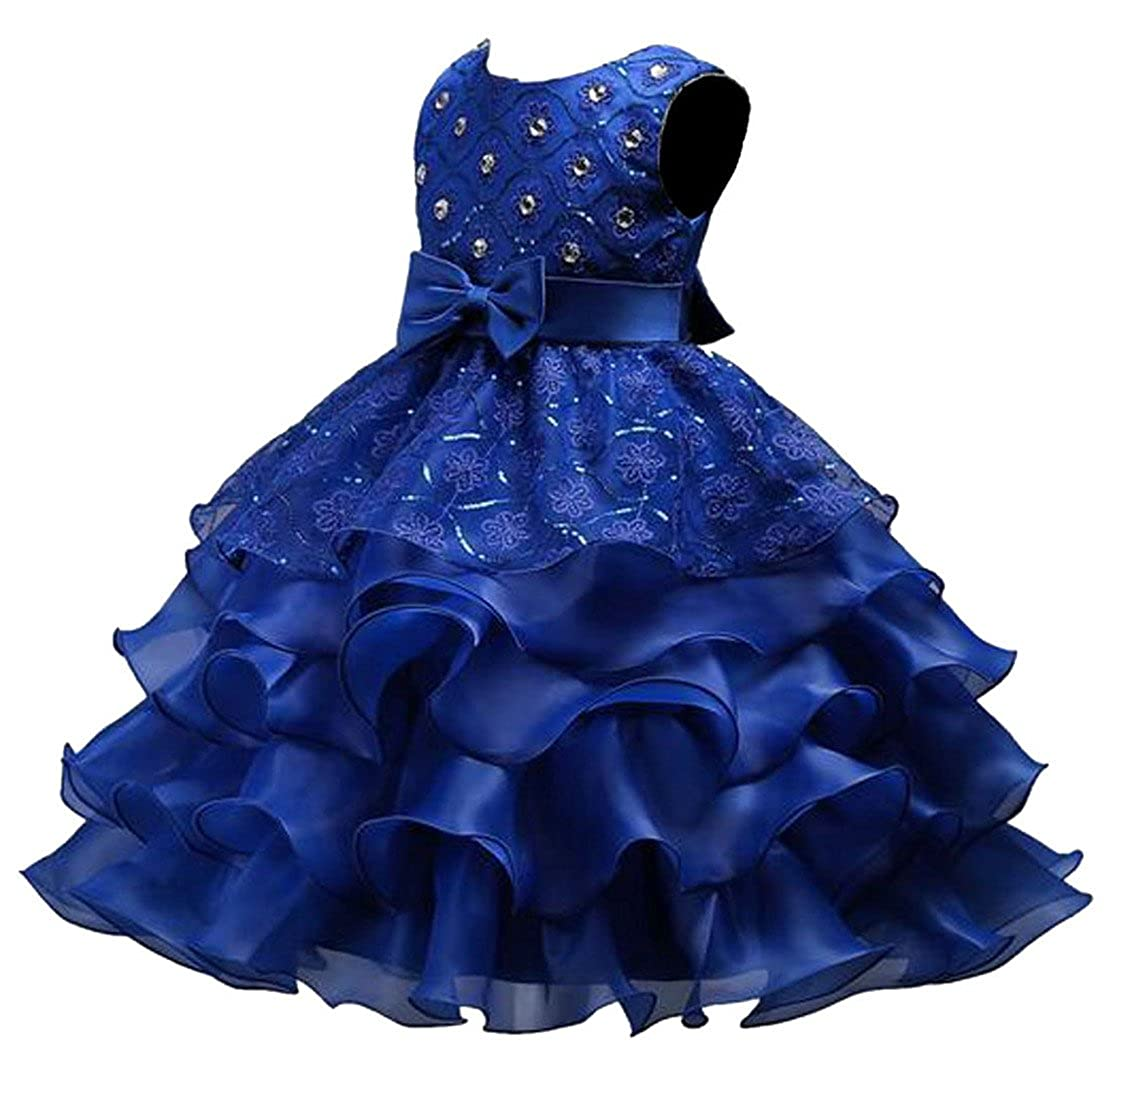 JuJuTa Girls Bowknot Sleeveless Sequins Solid Belted 4 Layer Tutu Dress